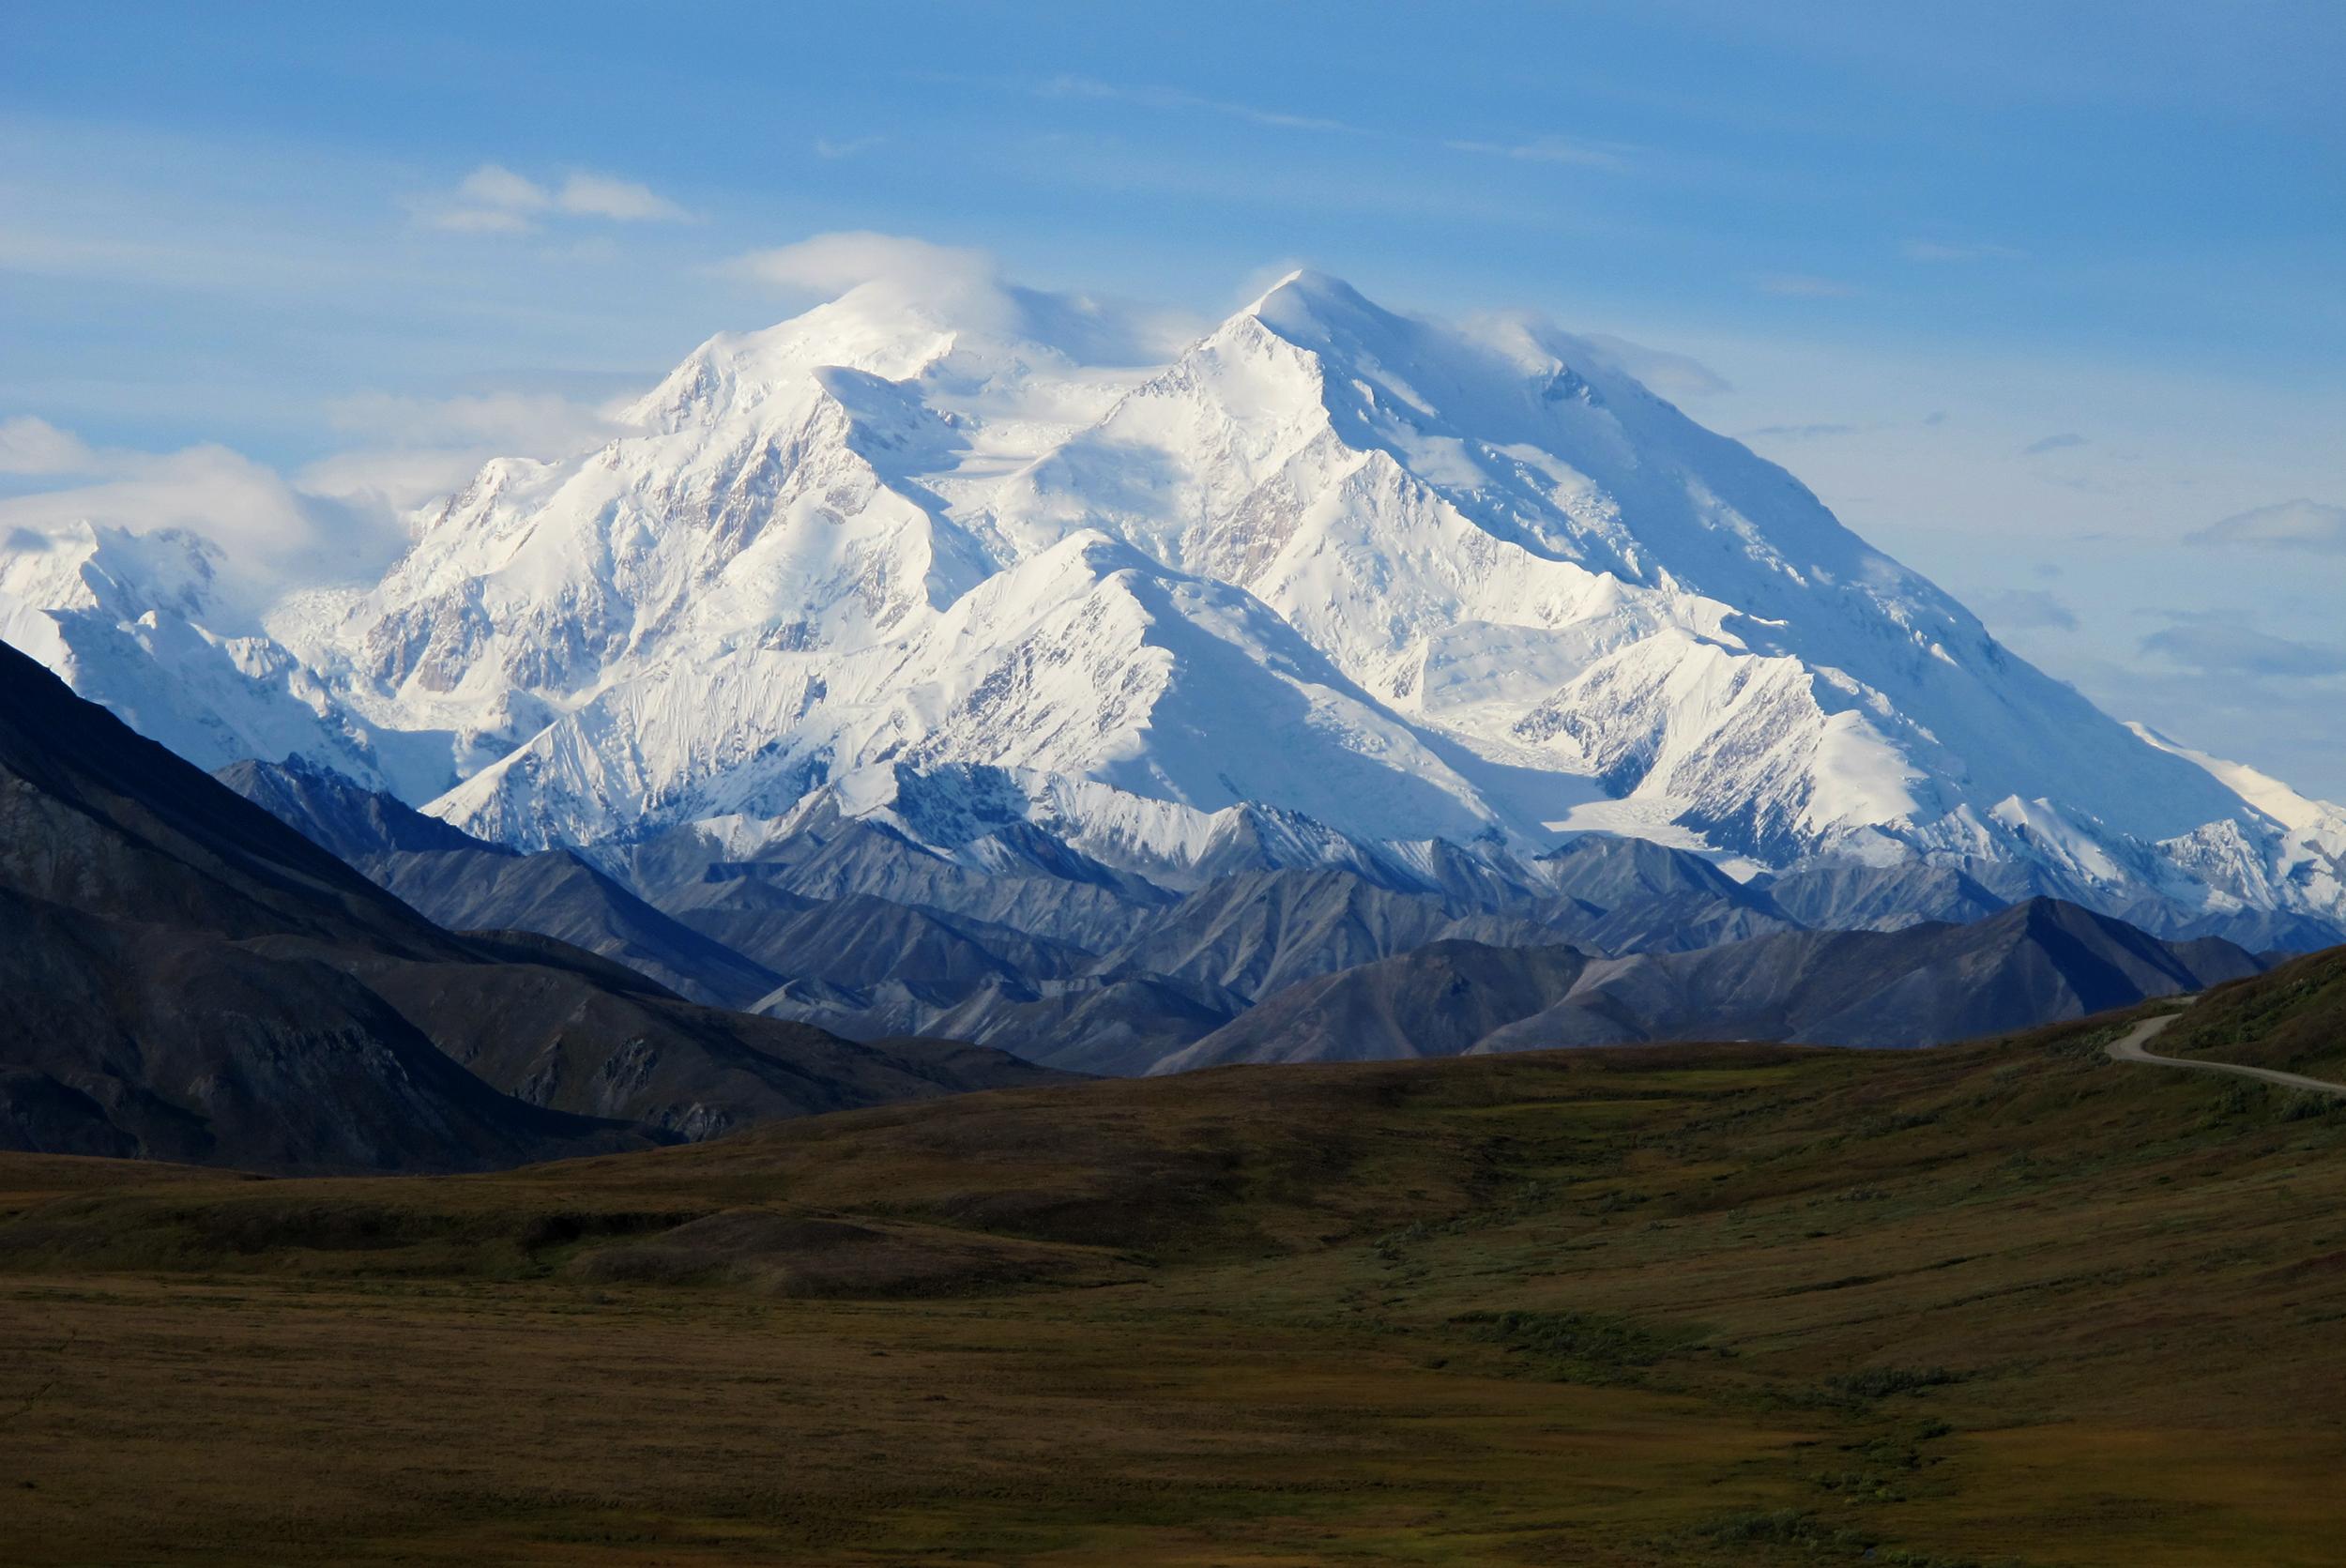 mckinley out denali in highest peak in north america renamed